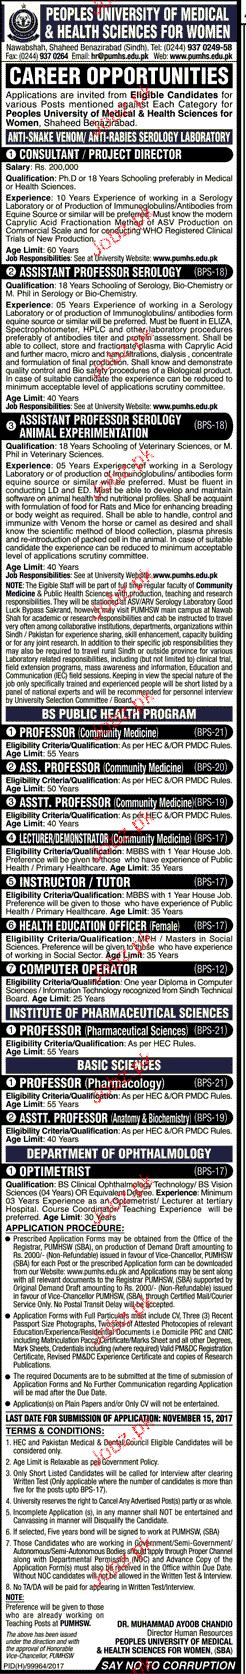 Peoples University of Medical & Health Sciences Jobs